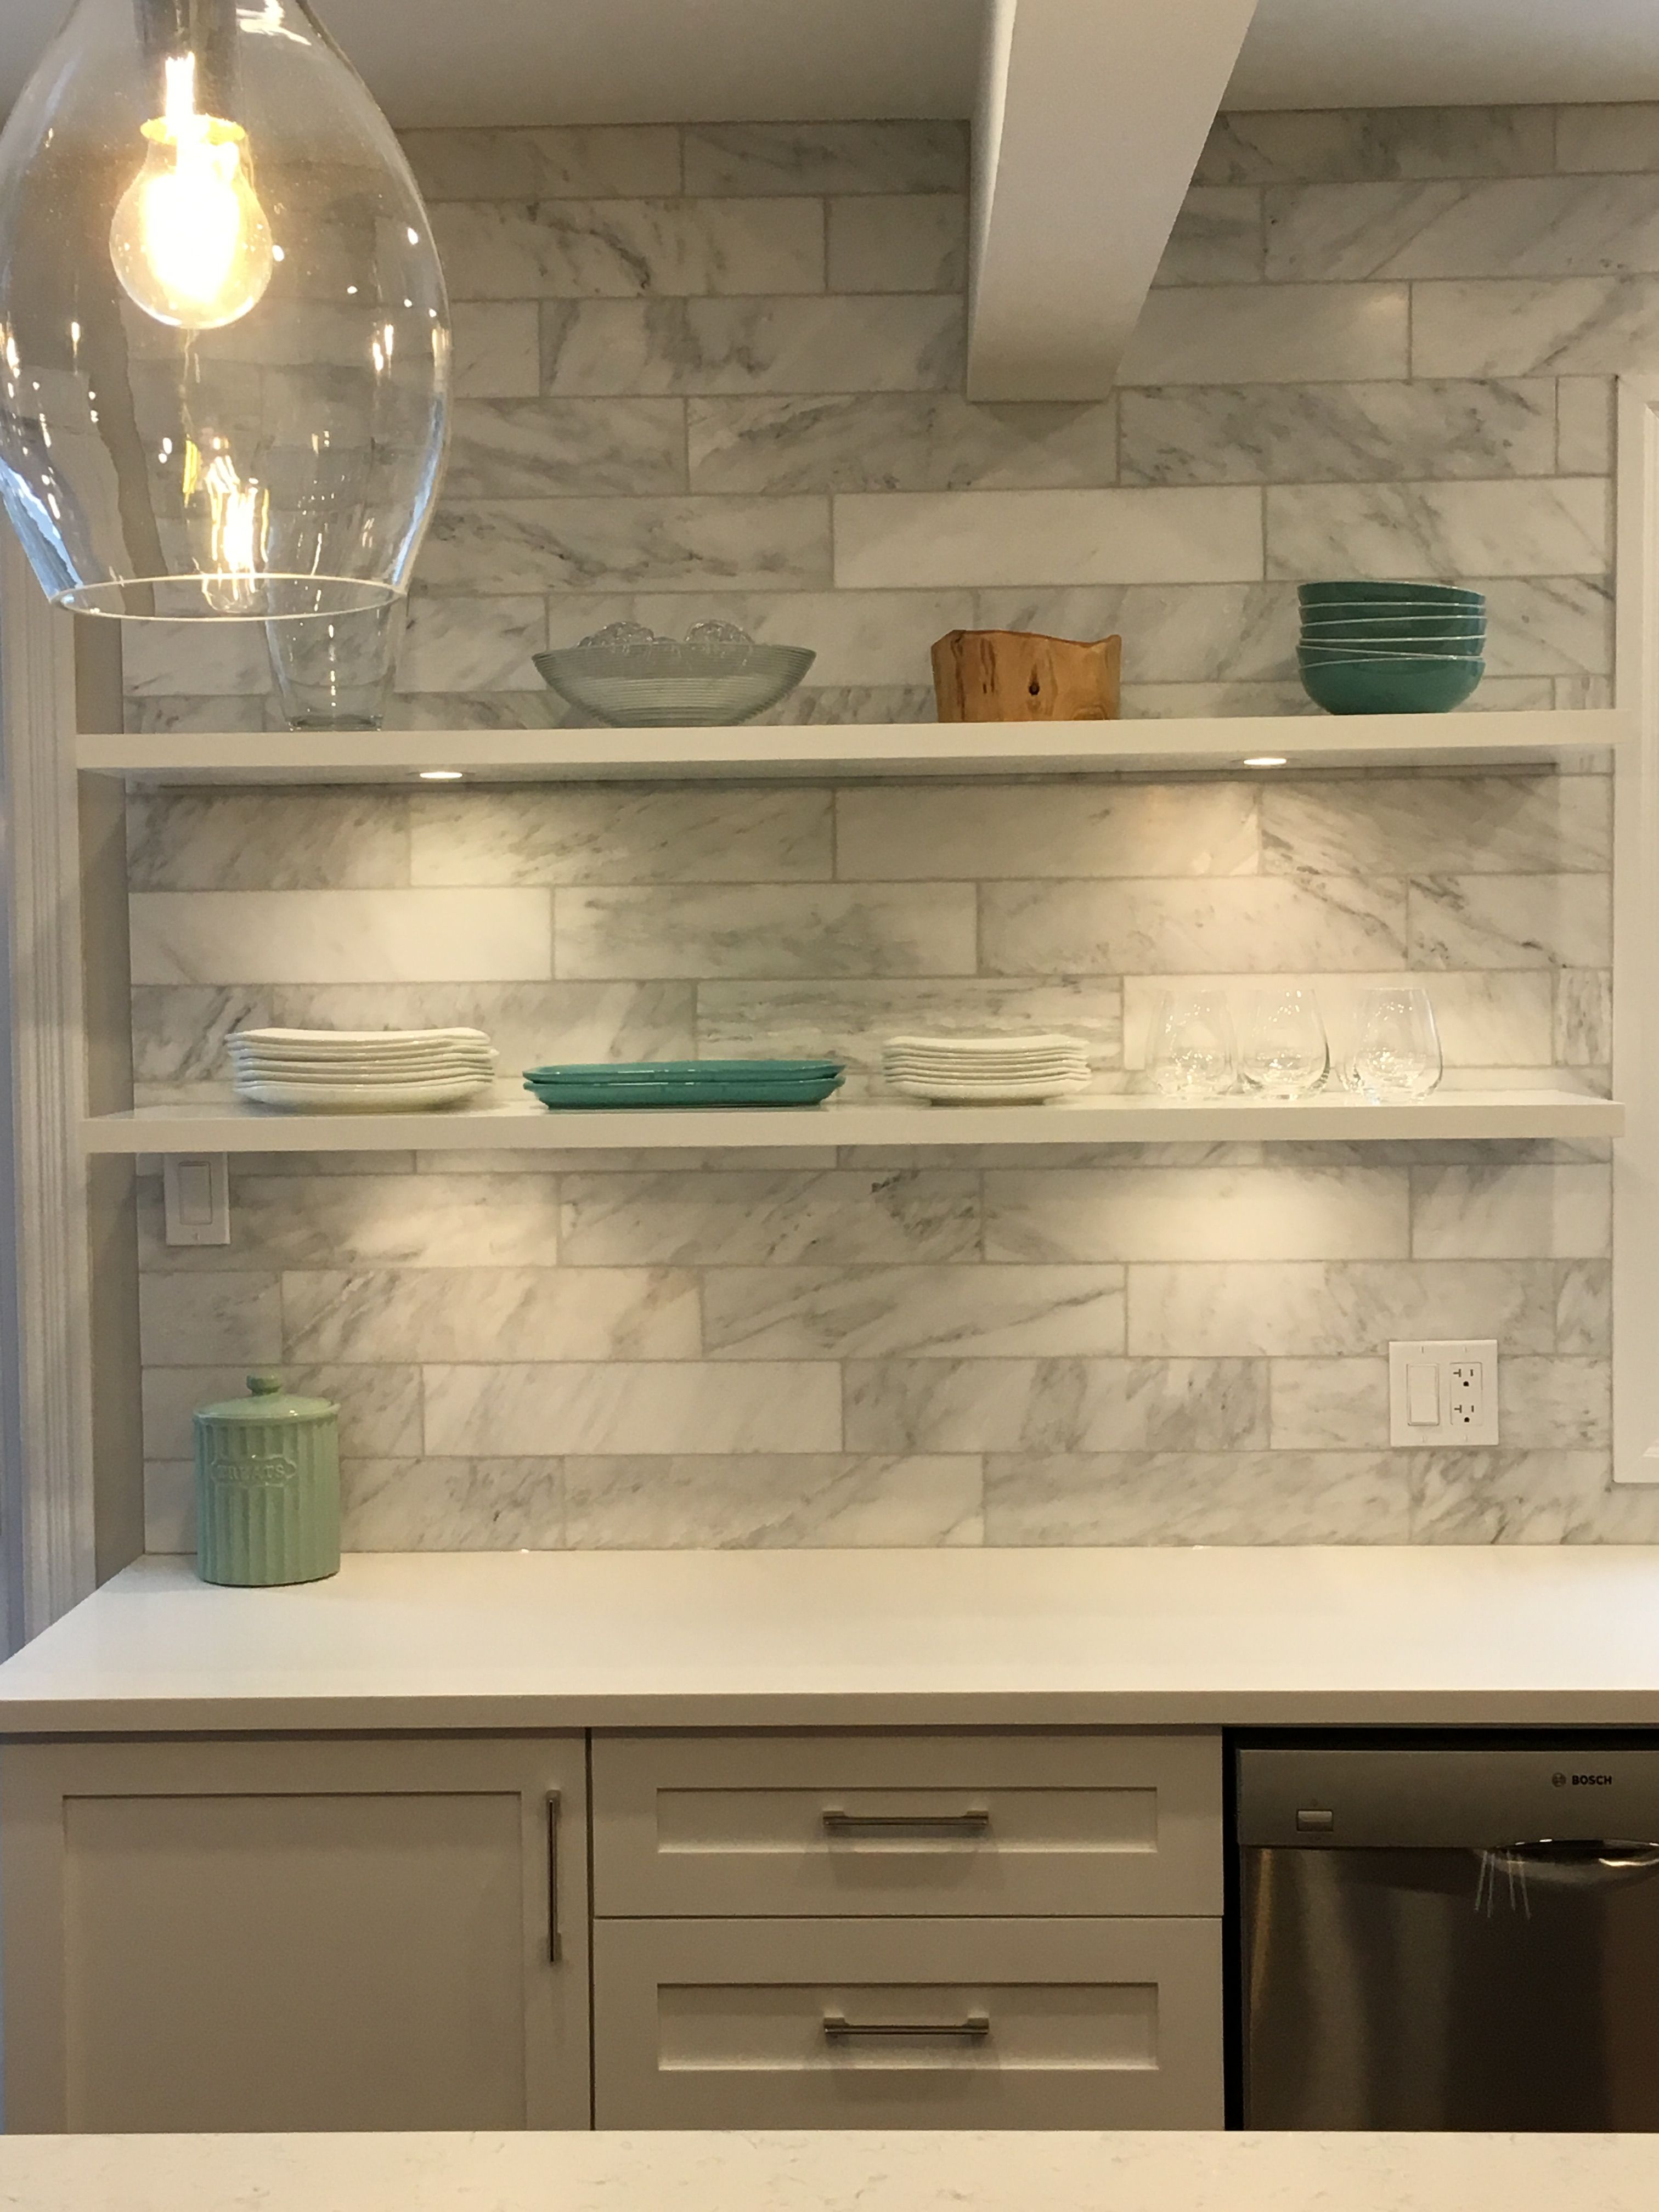 Kitchen Design Ideas Kitchen Backsplash Ideas White Kitchen Honed Oriental White Marble Backspla Quartz Backsplash White Marble Backsplash Marble Backsplash